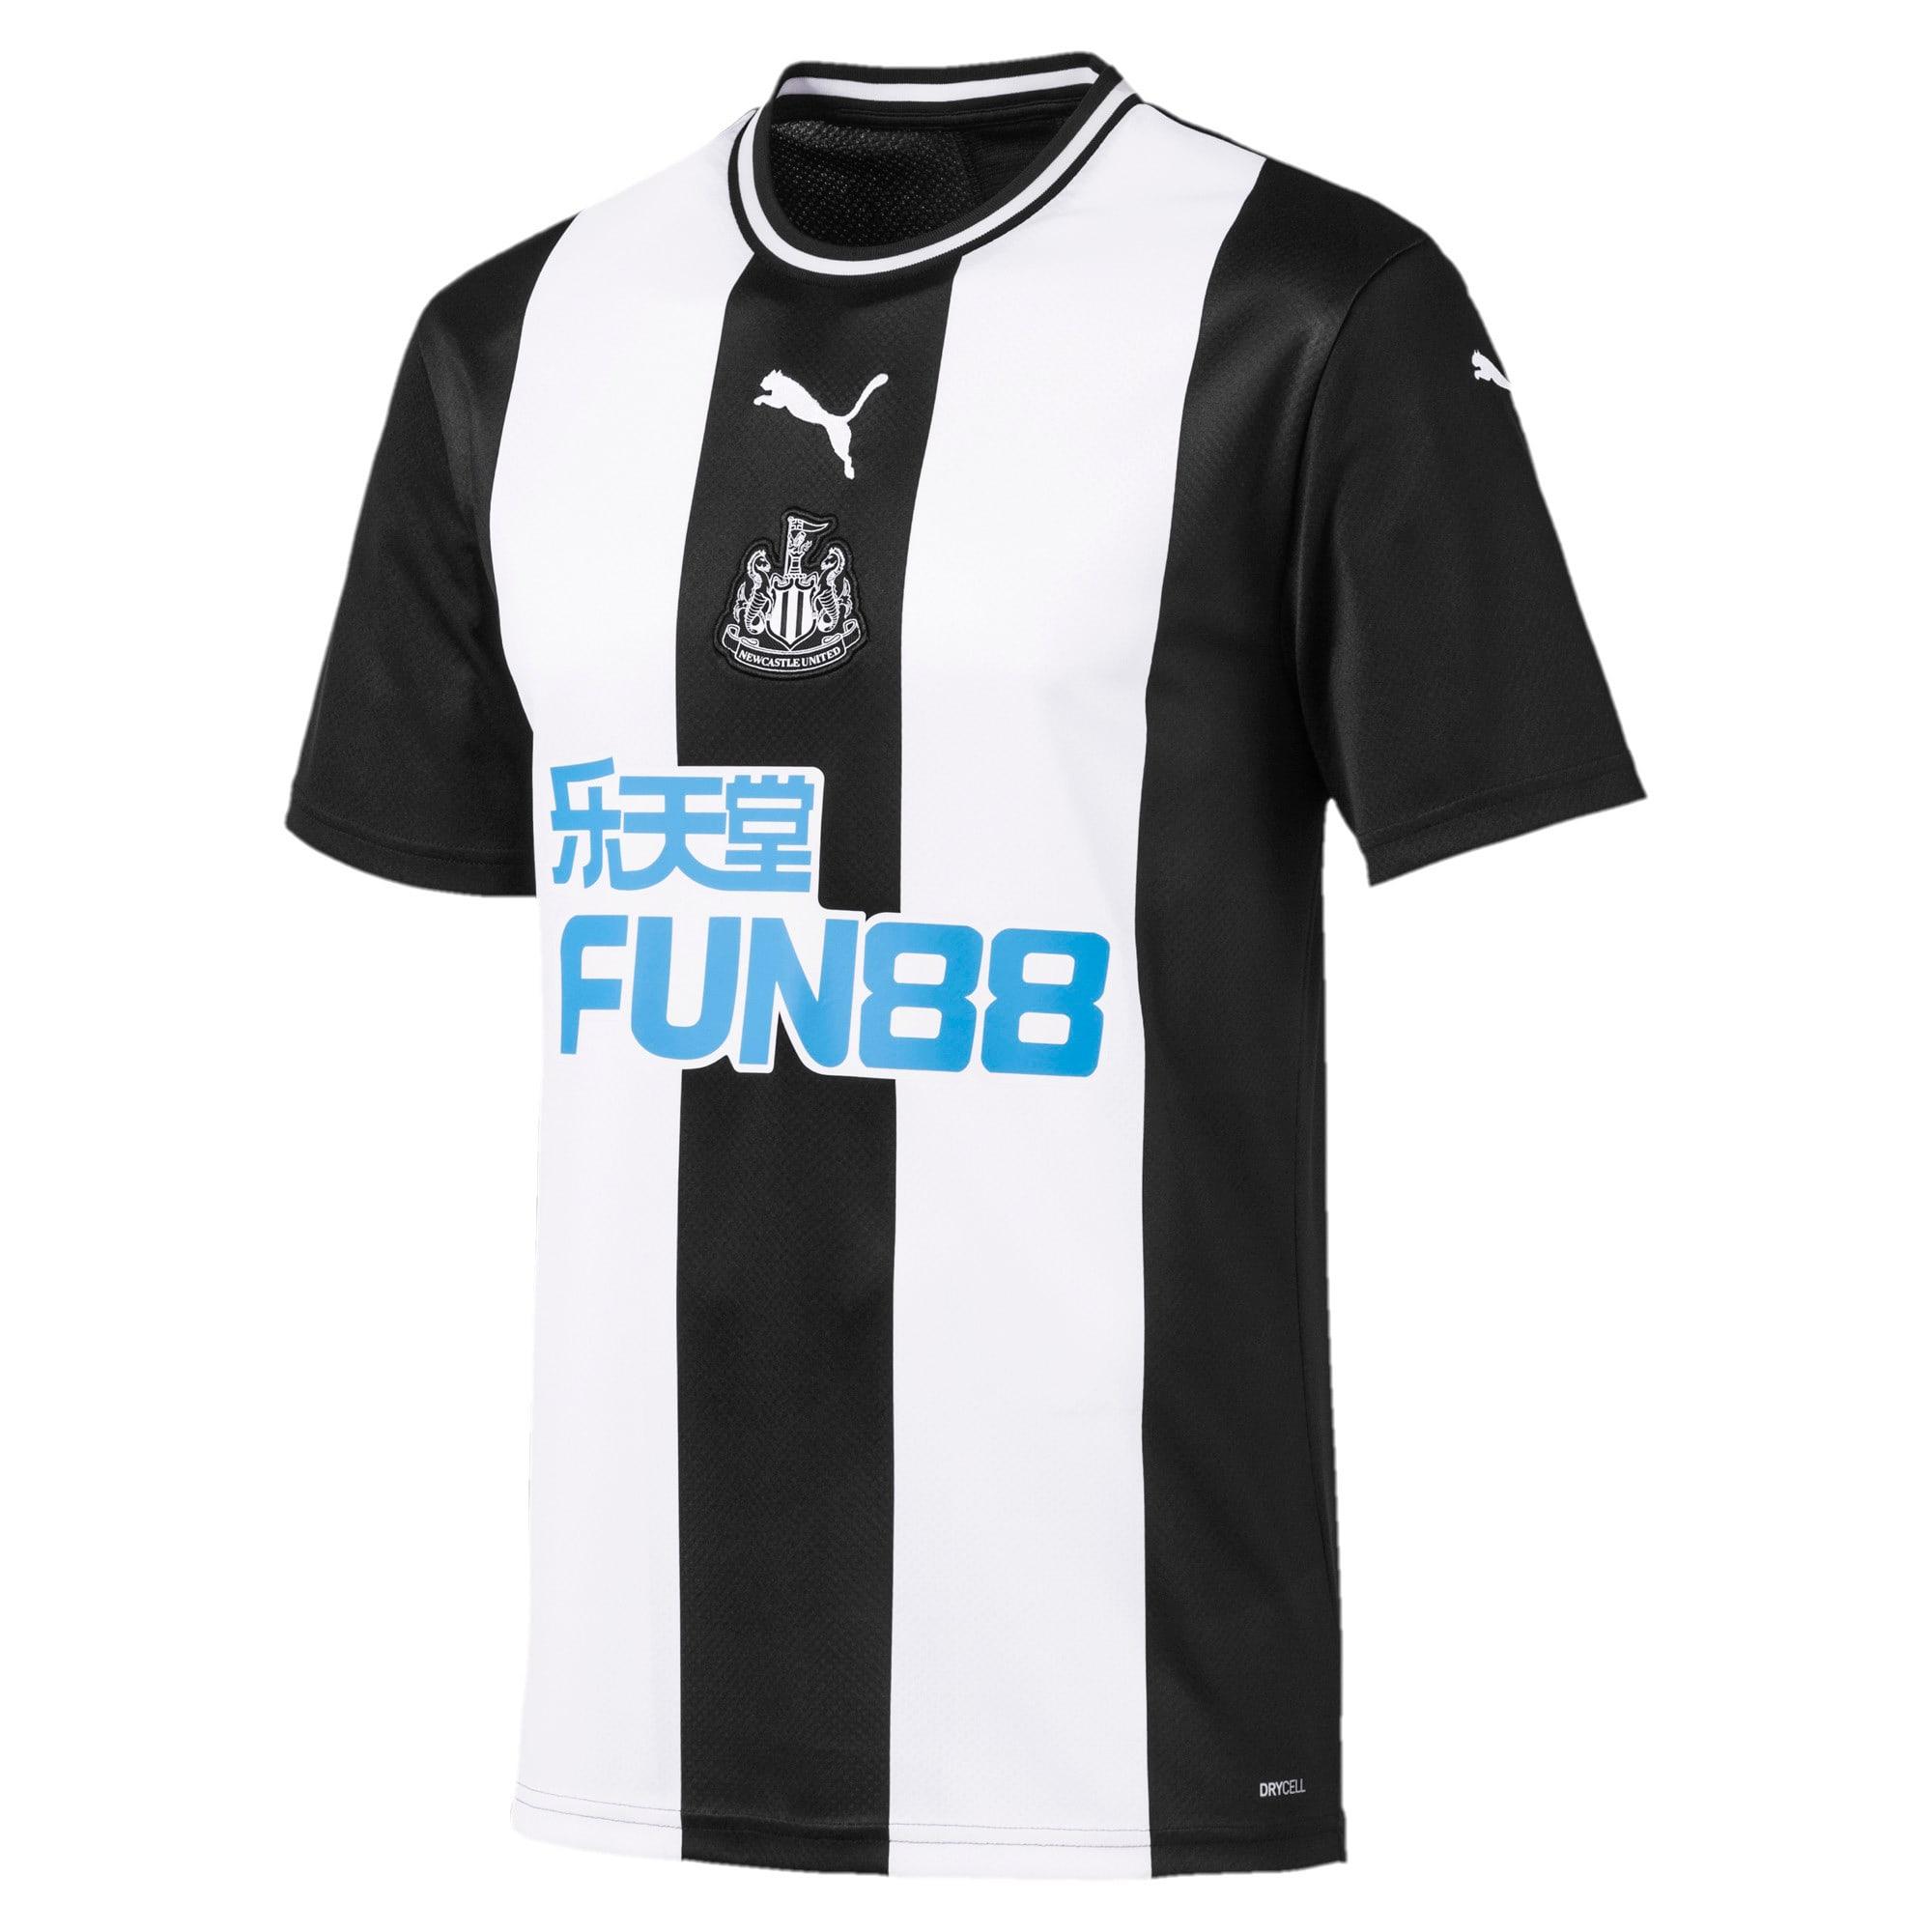 Thumbnail 1 of Newcastle United FC Herren Replica Heimtrikot, Puma White-Puma Black, medium